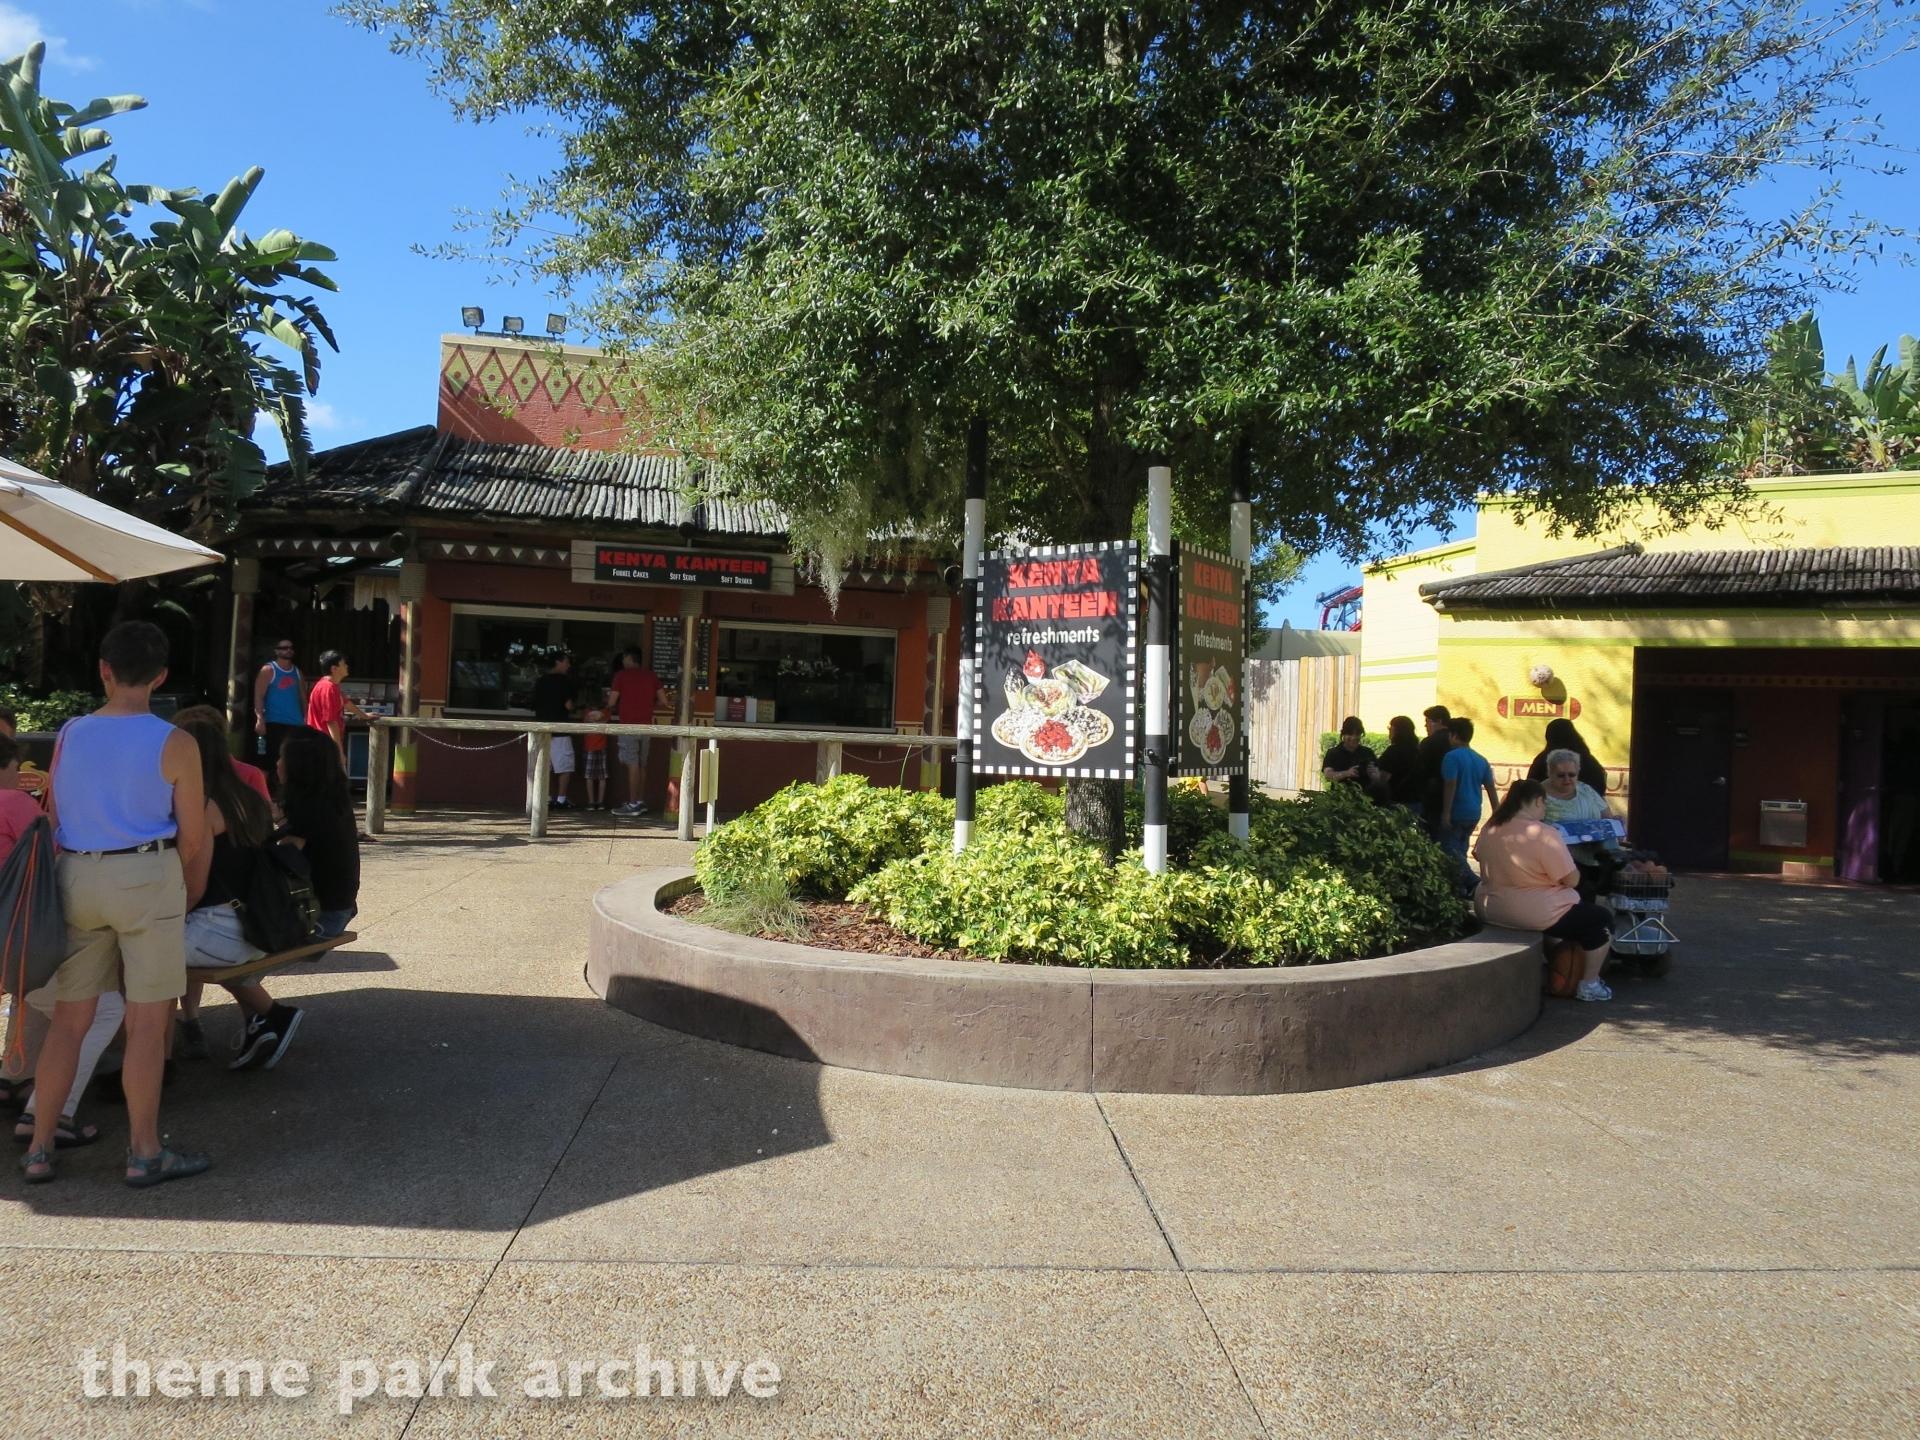 Edge of Africa at Busch Gardens Tampa